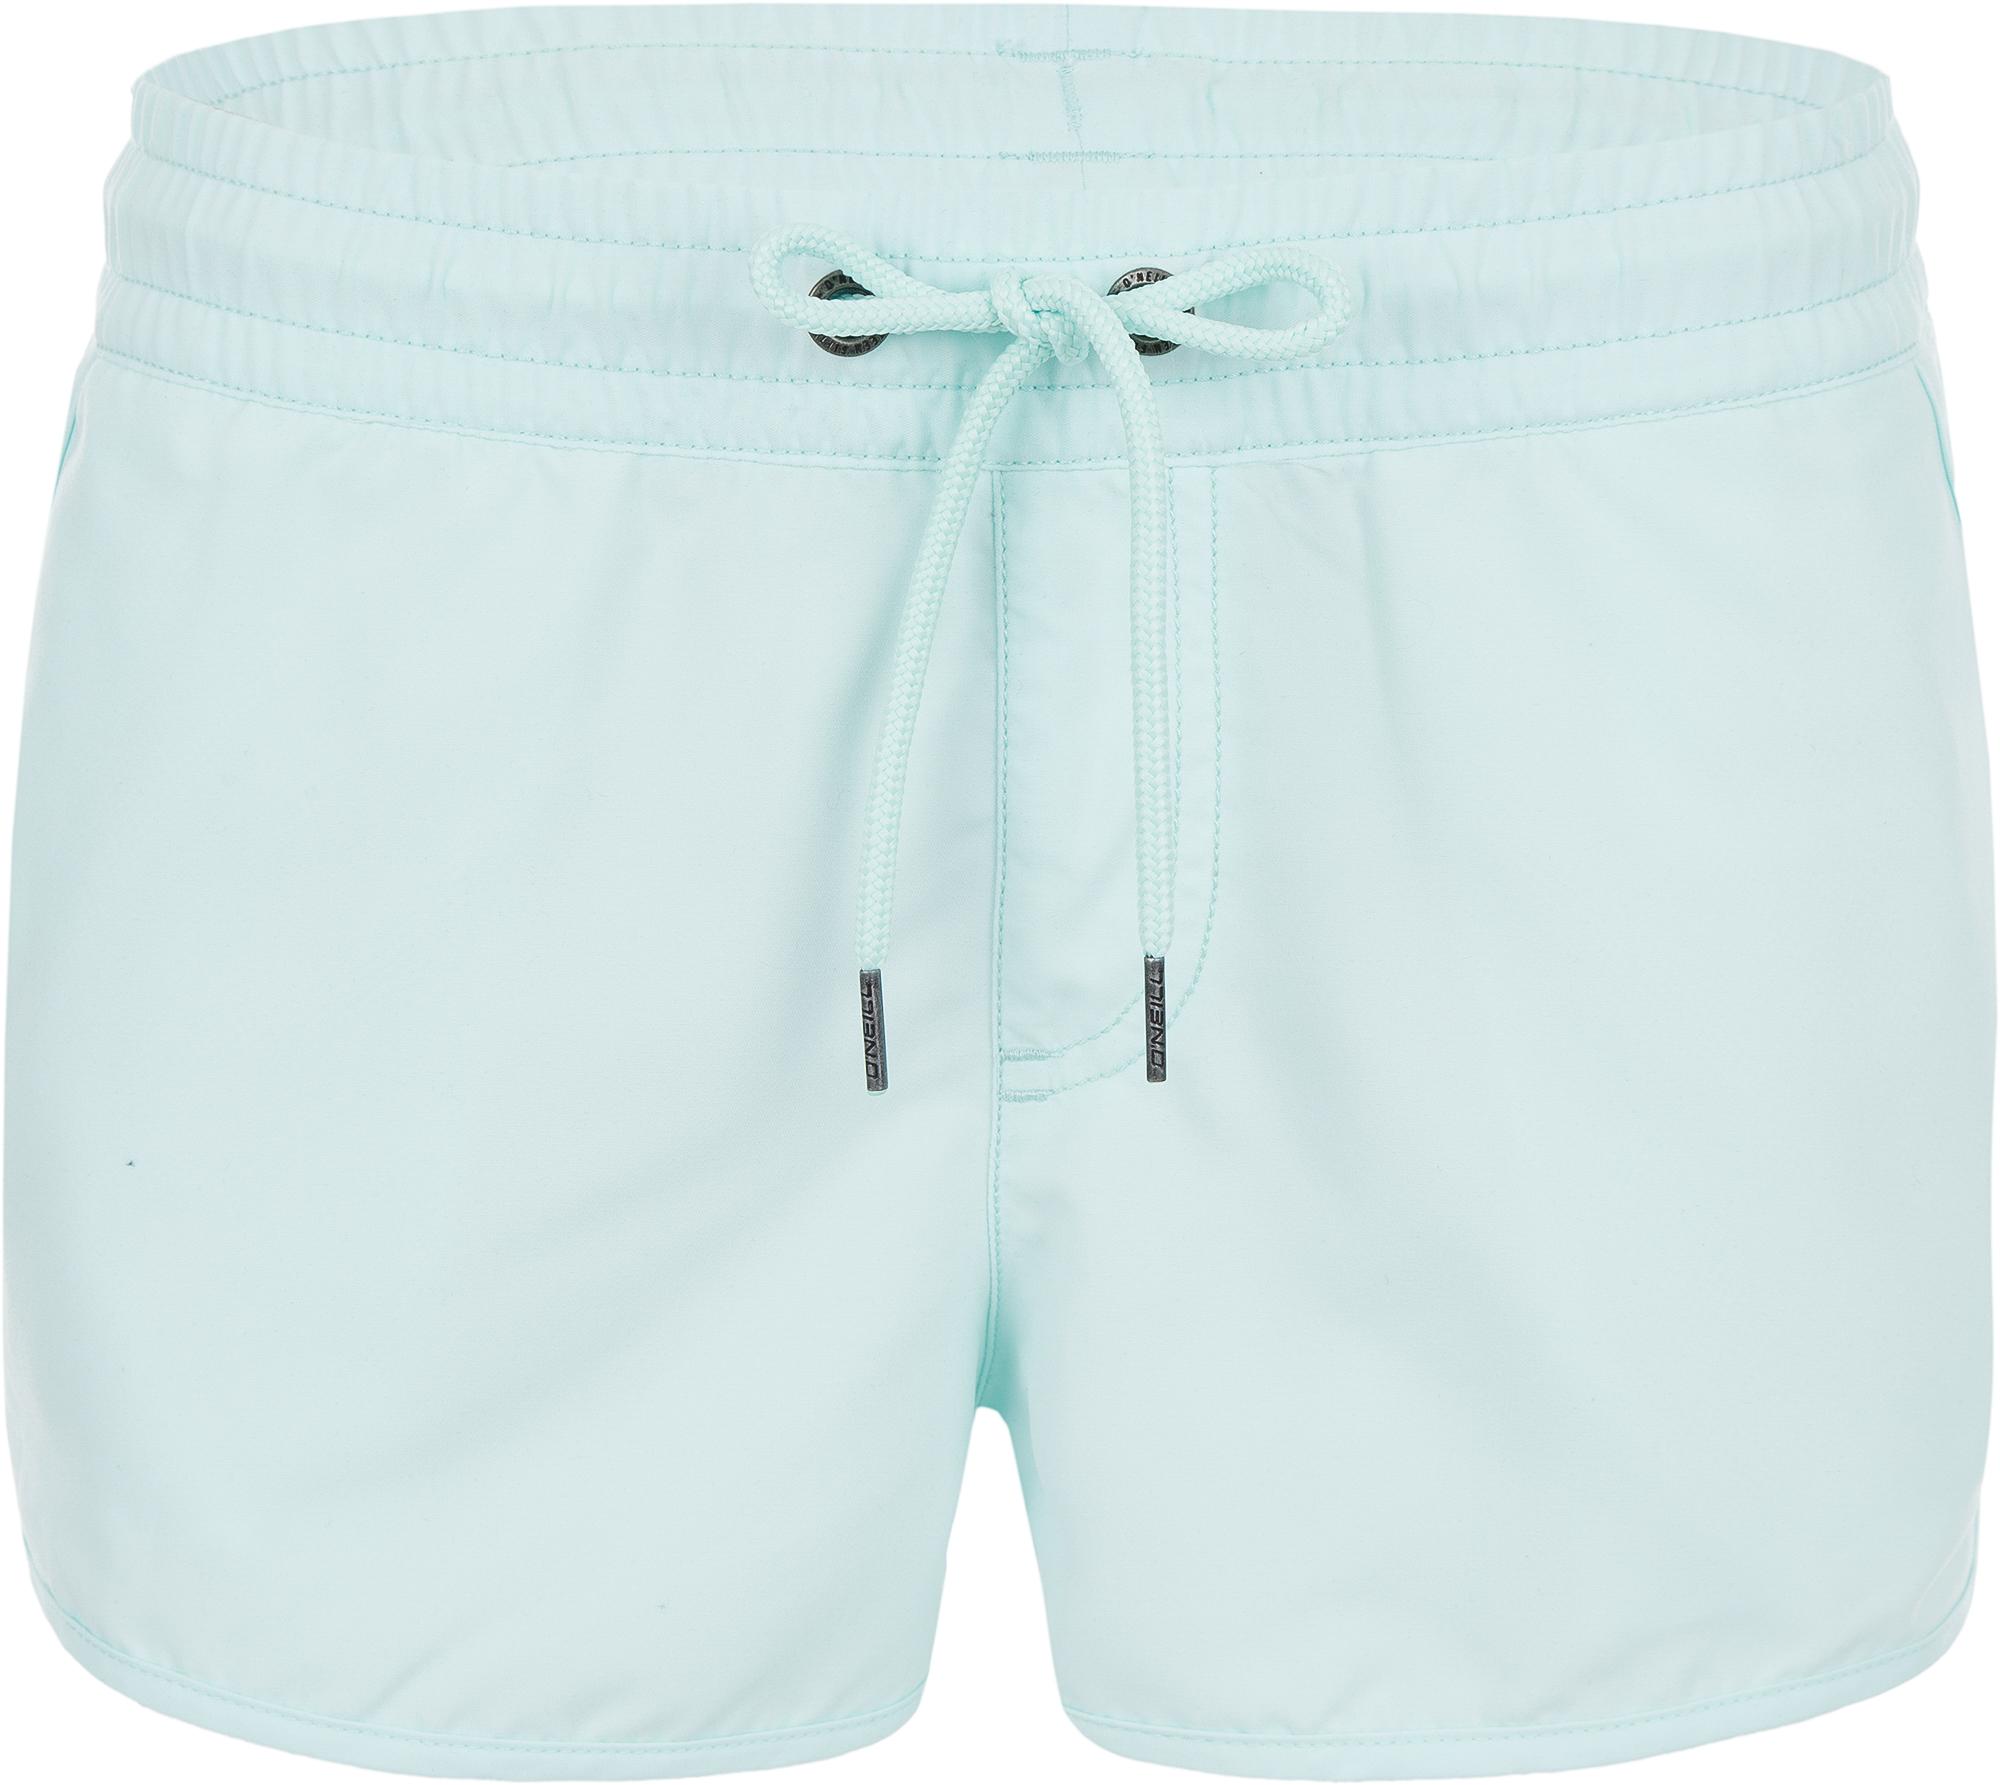 O'Neill Шорты пляжные женские O'Neill Pw Solid, размер 50-52 цена